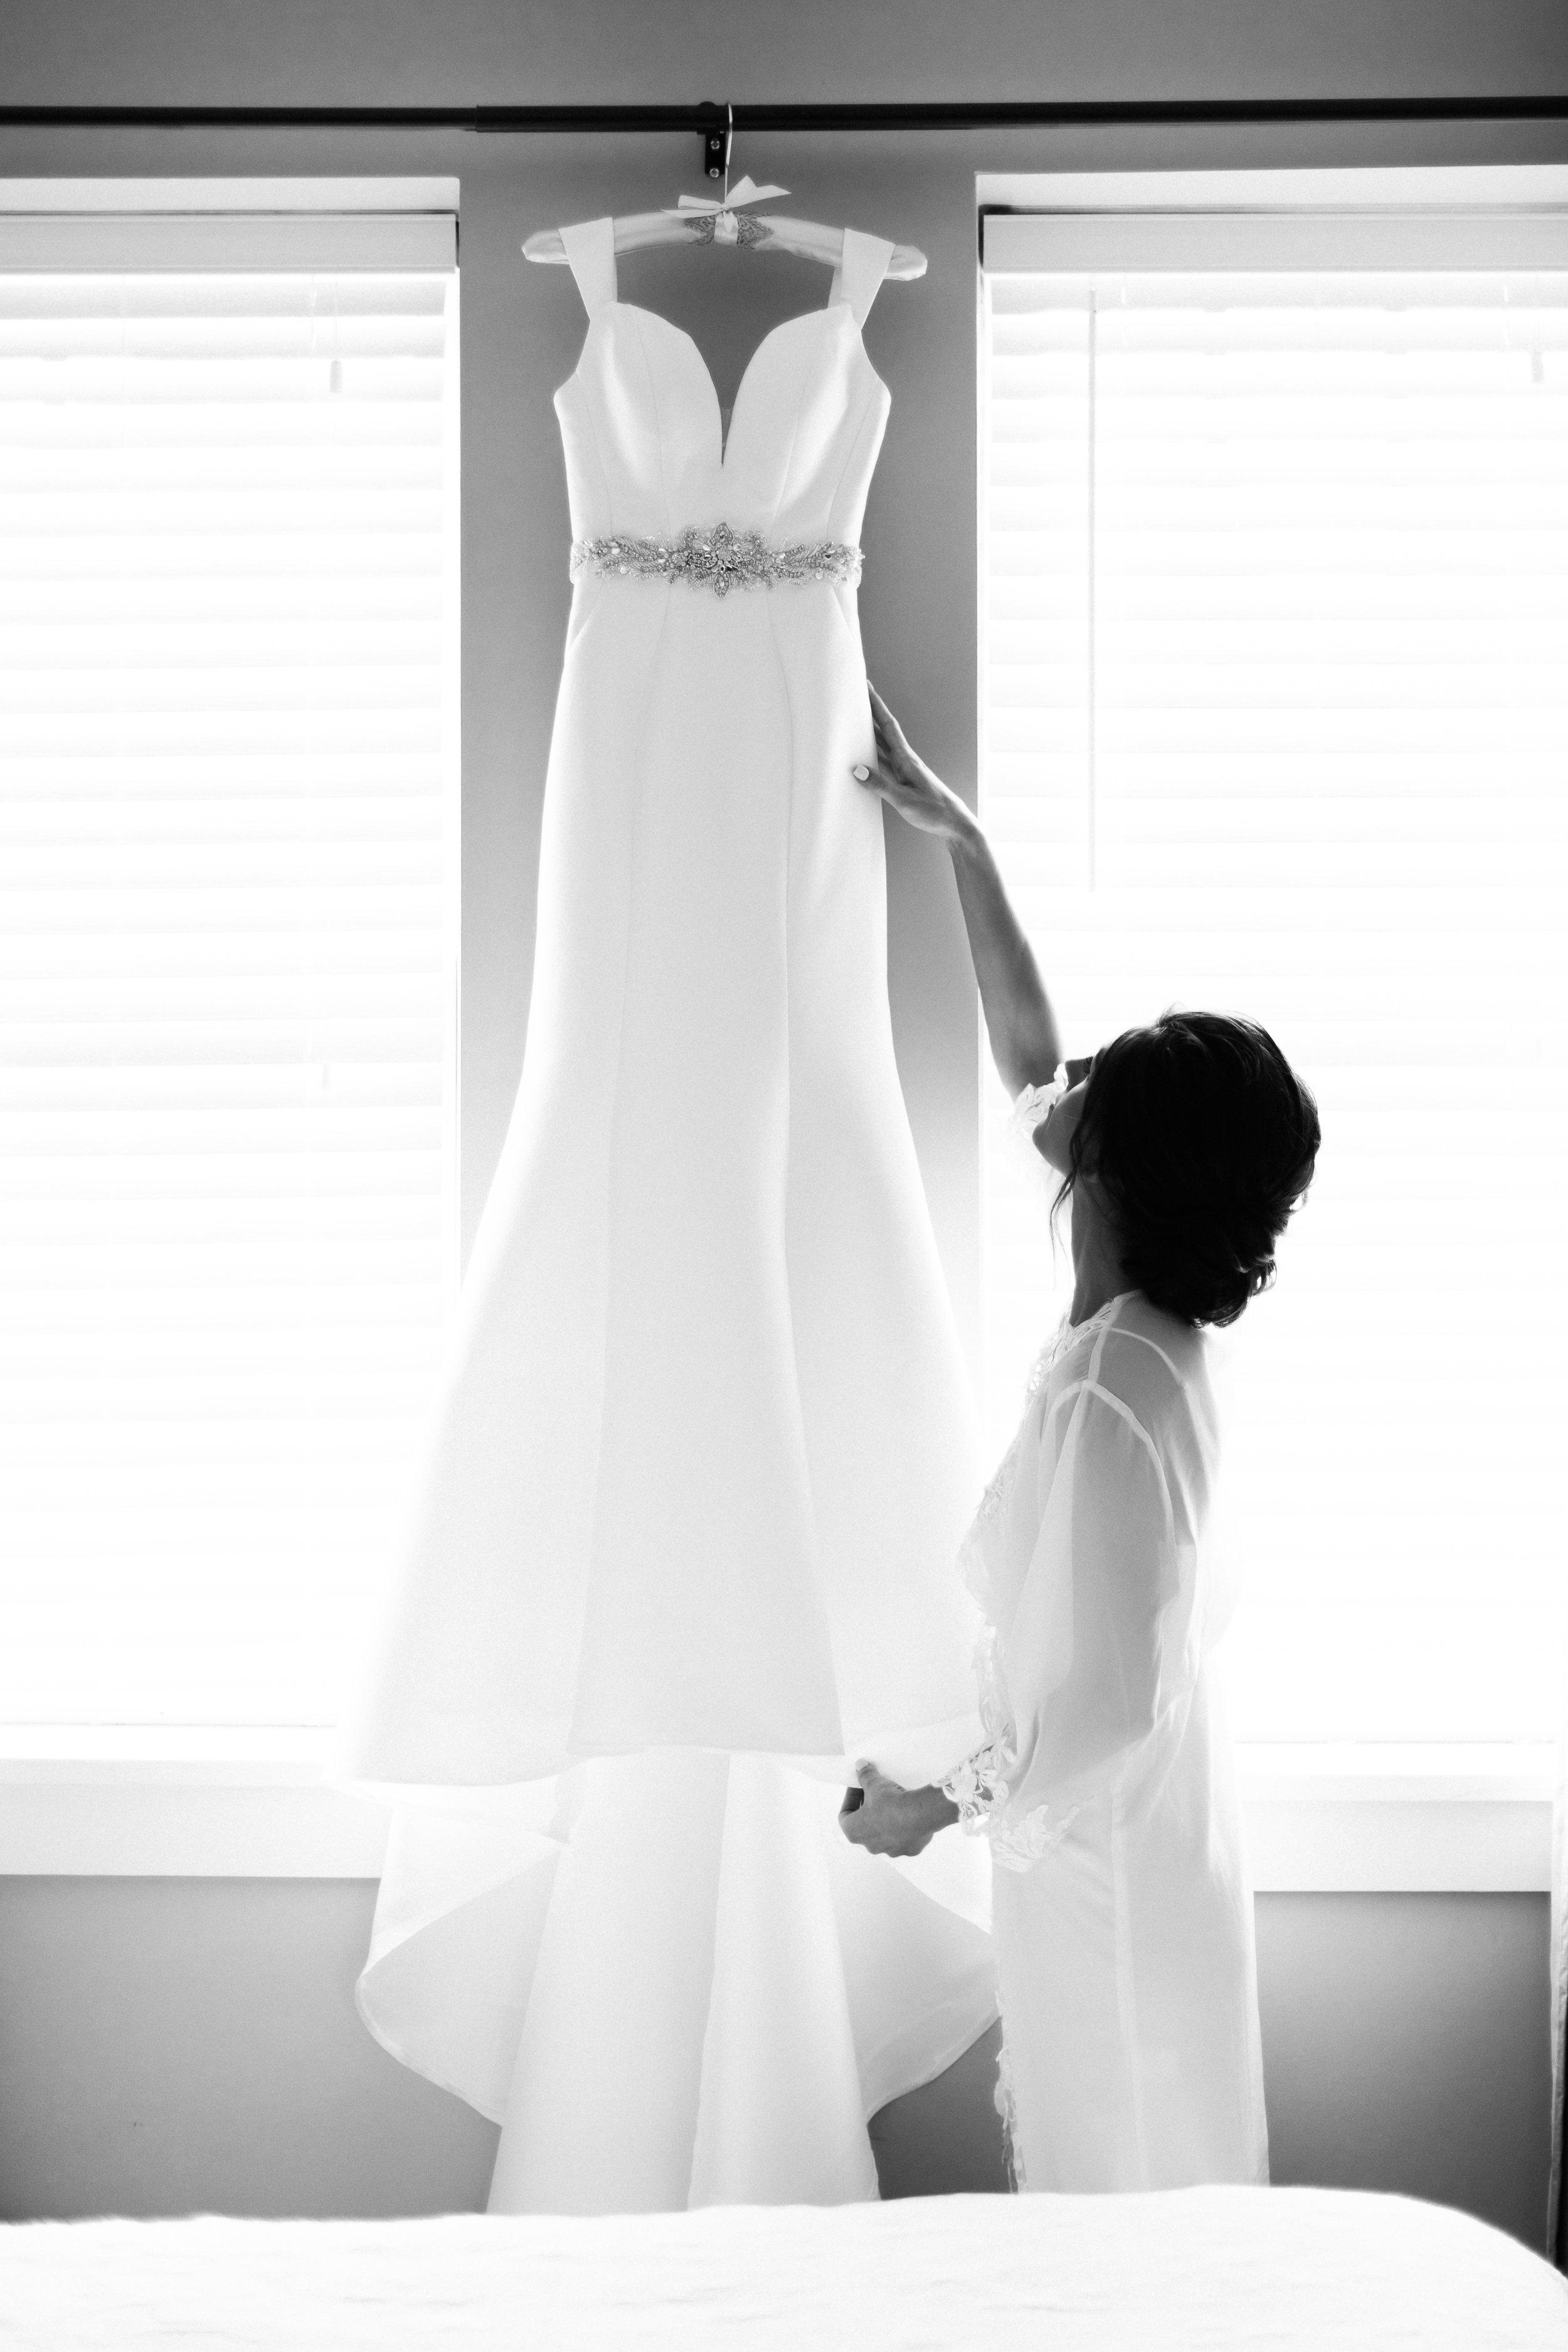 Taylor_TJ_St_Augustine_Treasury_on_the_Plaza_Wedding_Photography__0005_-5.jpg